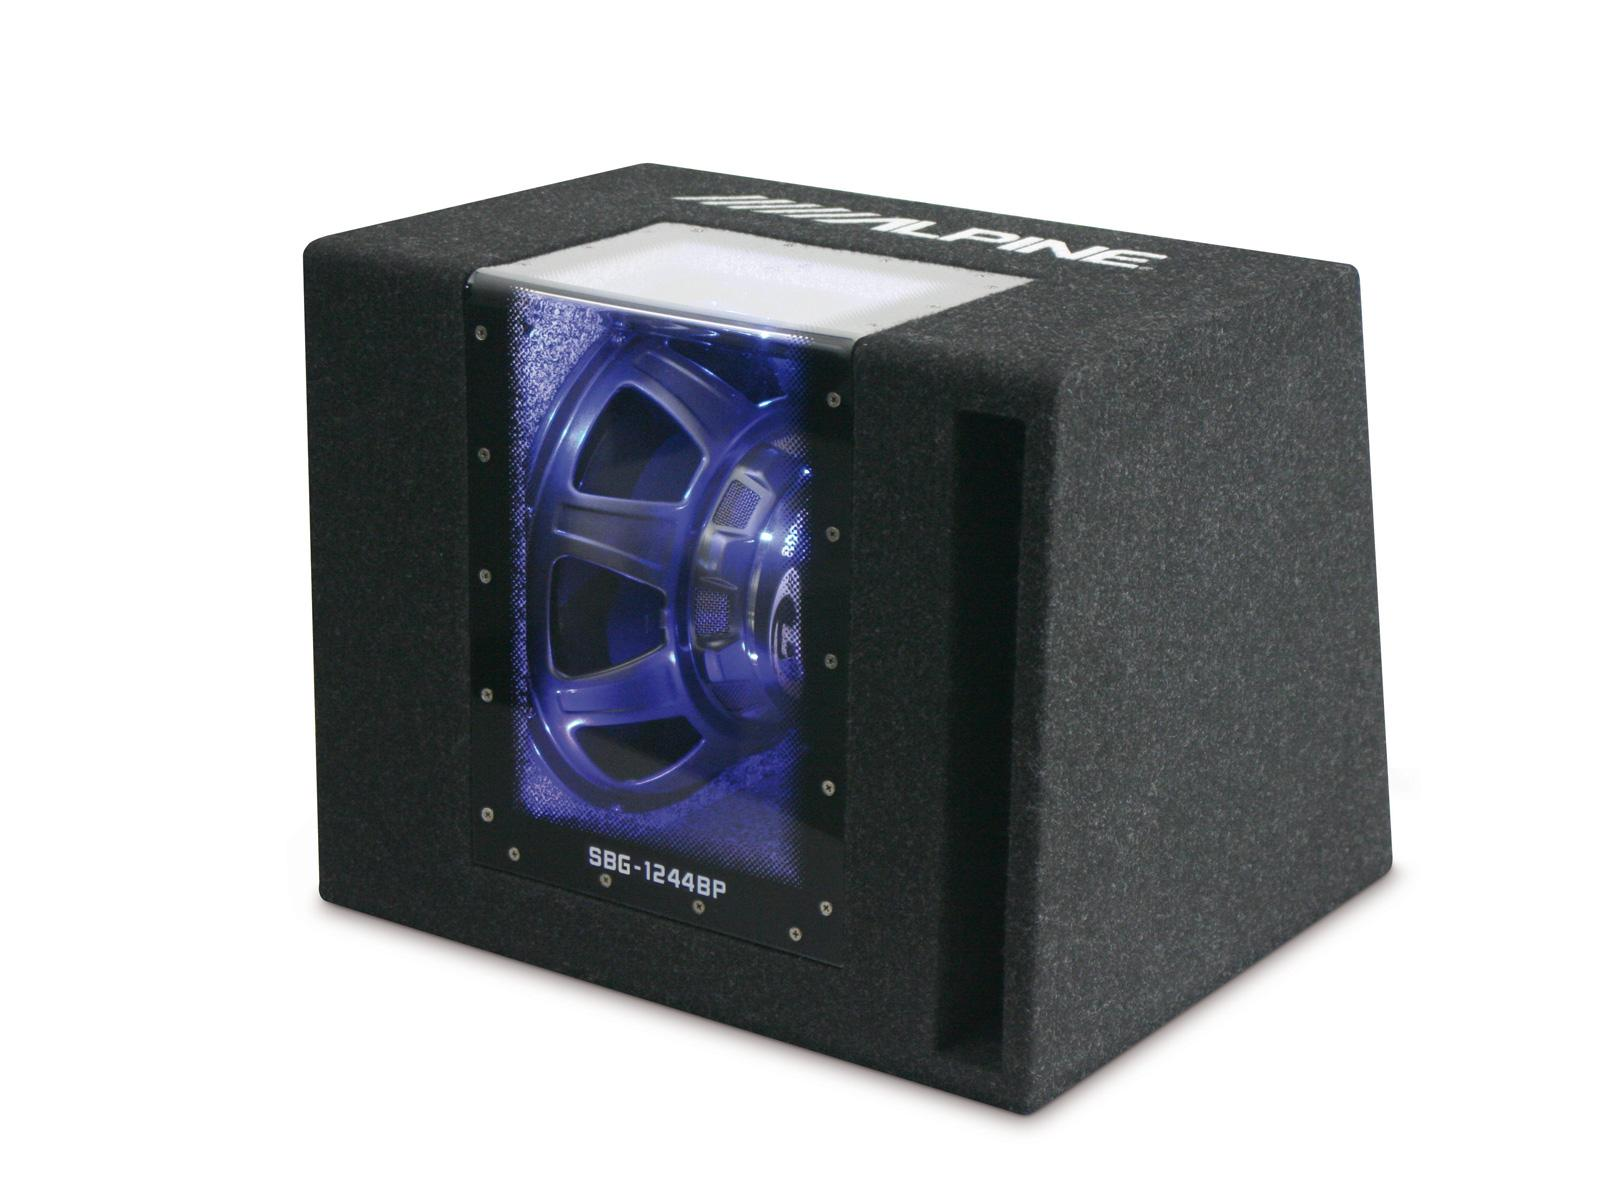 alpine sbg 1244bp caisson bass reflex subwoofer 30cm 800w max 354007. Black Bedroom Furniture Sets. Home Design Ideas